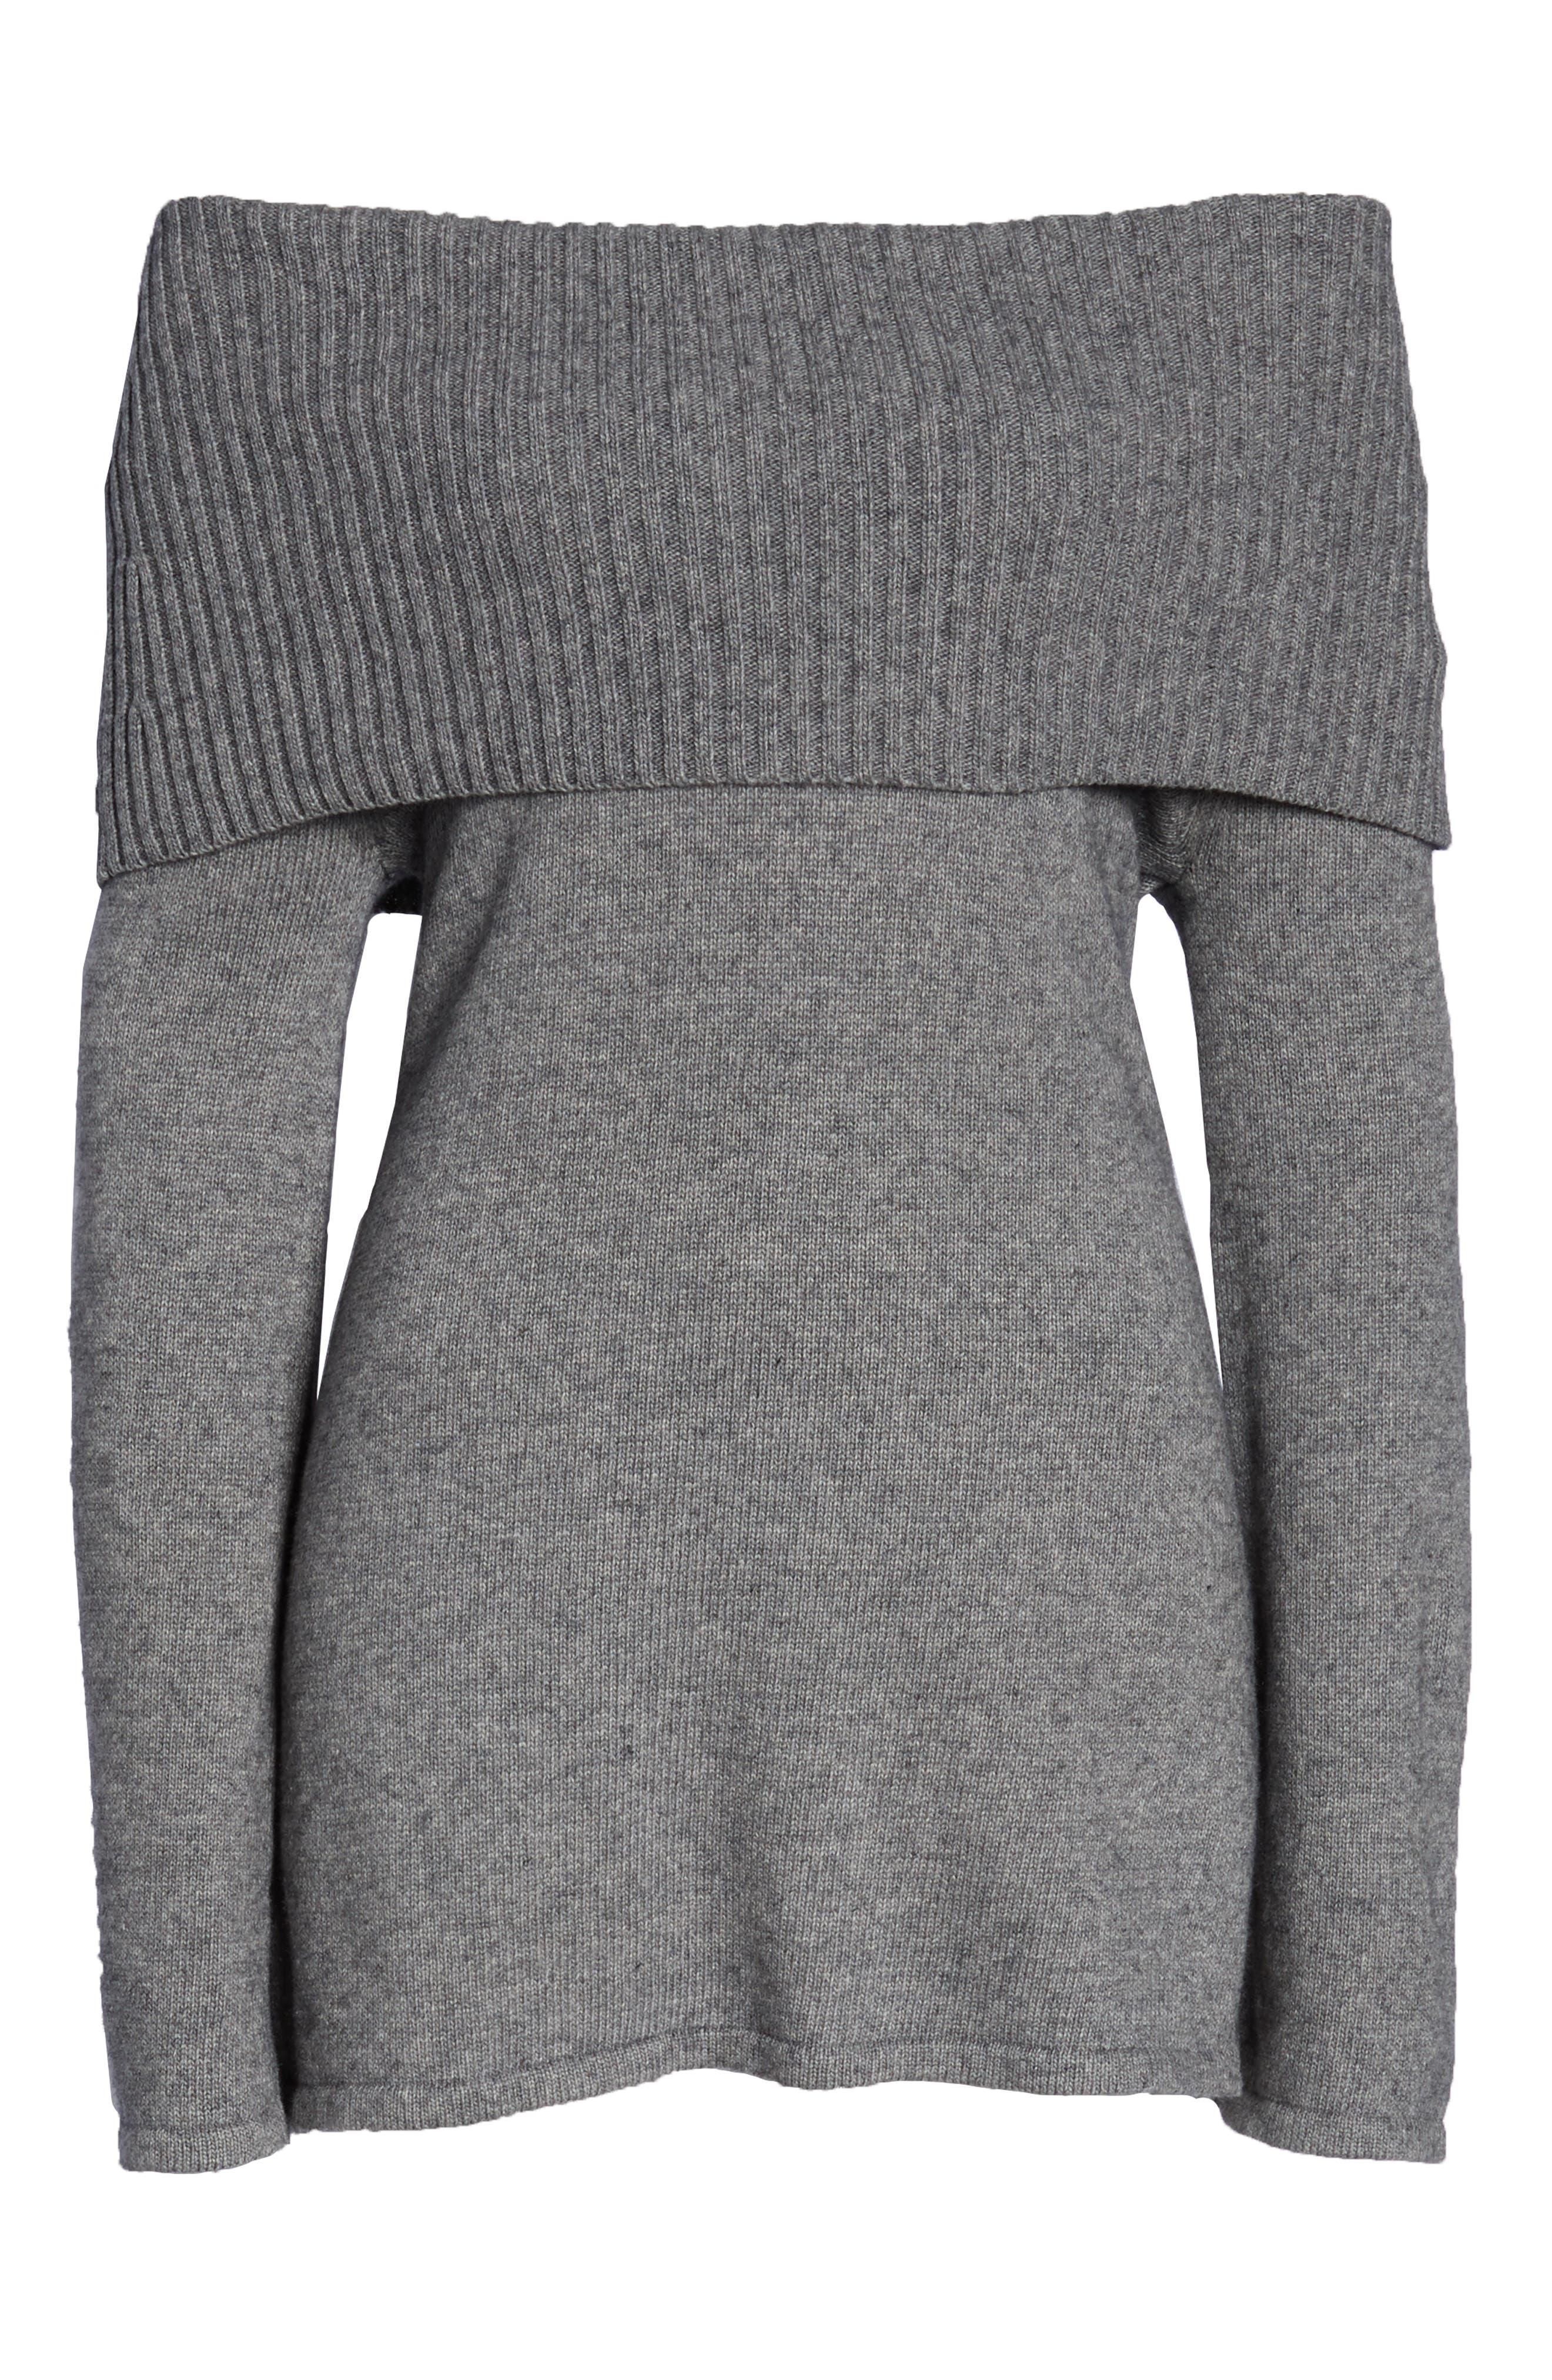 Rhodyn Off The Shoulder Sweater,                             Alternate thumbnail 6, color,                             GREY HEATHER